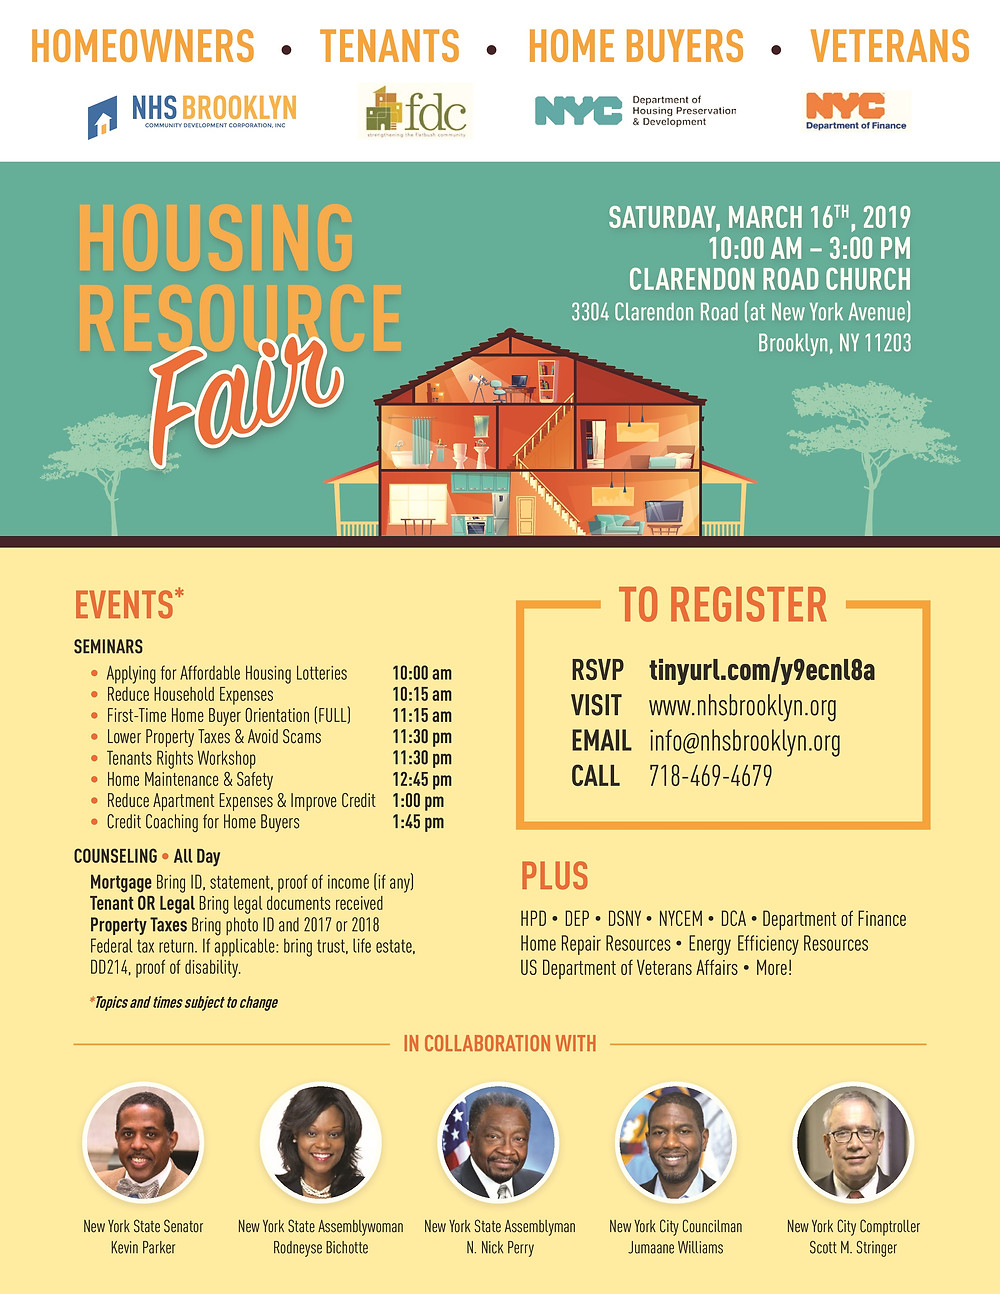 Housing Resource Fair NHS Brooklyn FDC East Flatbush 2019